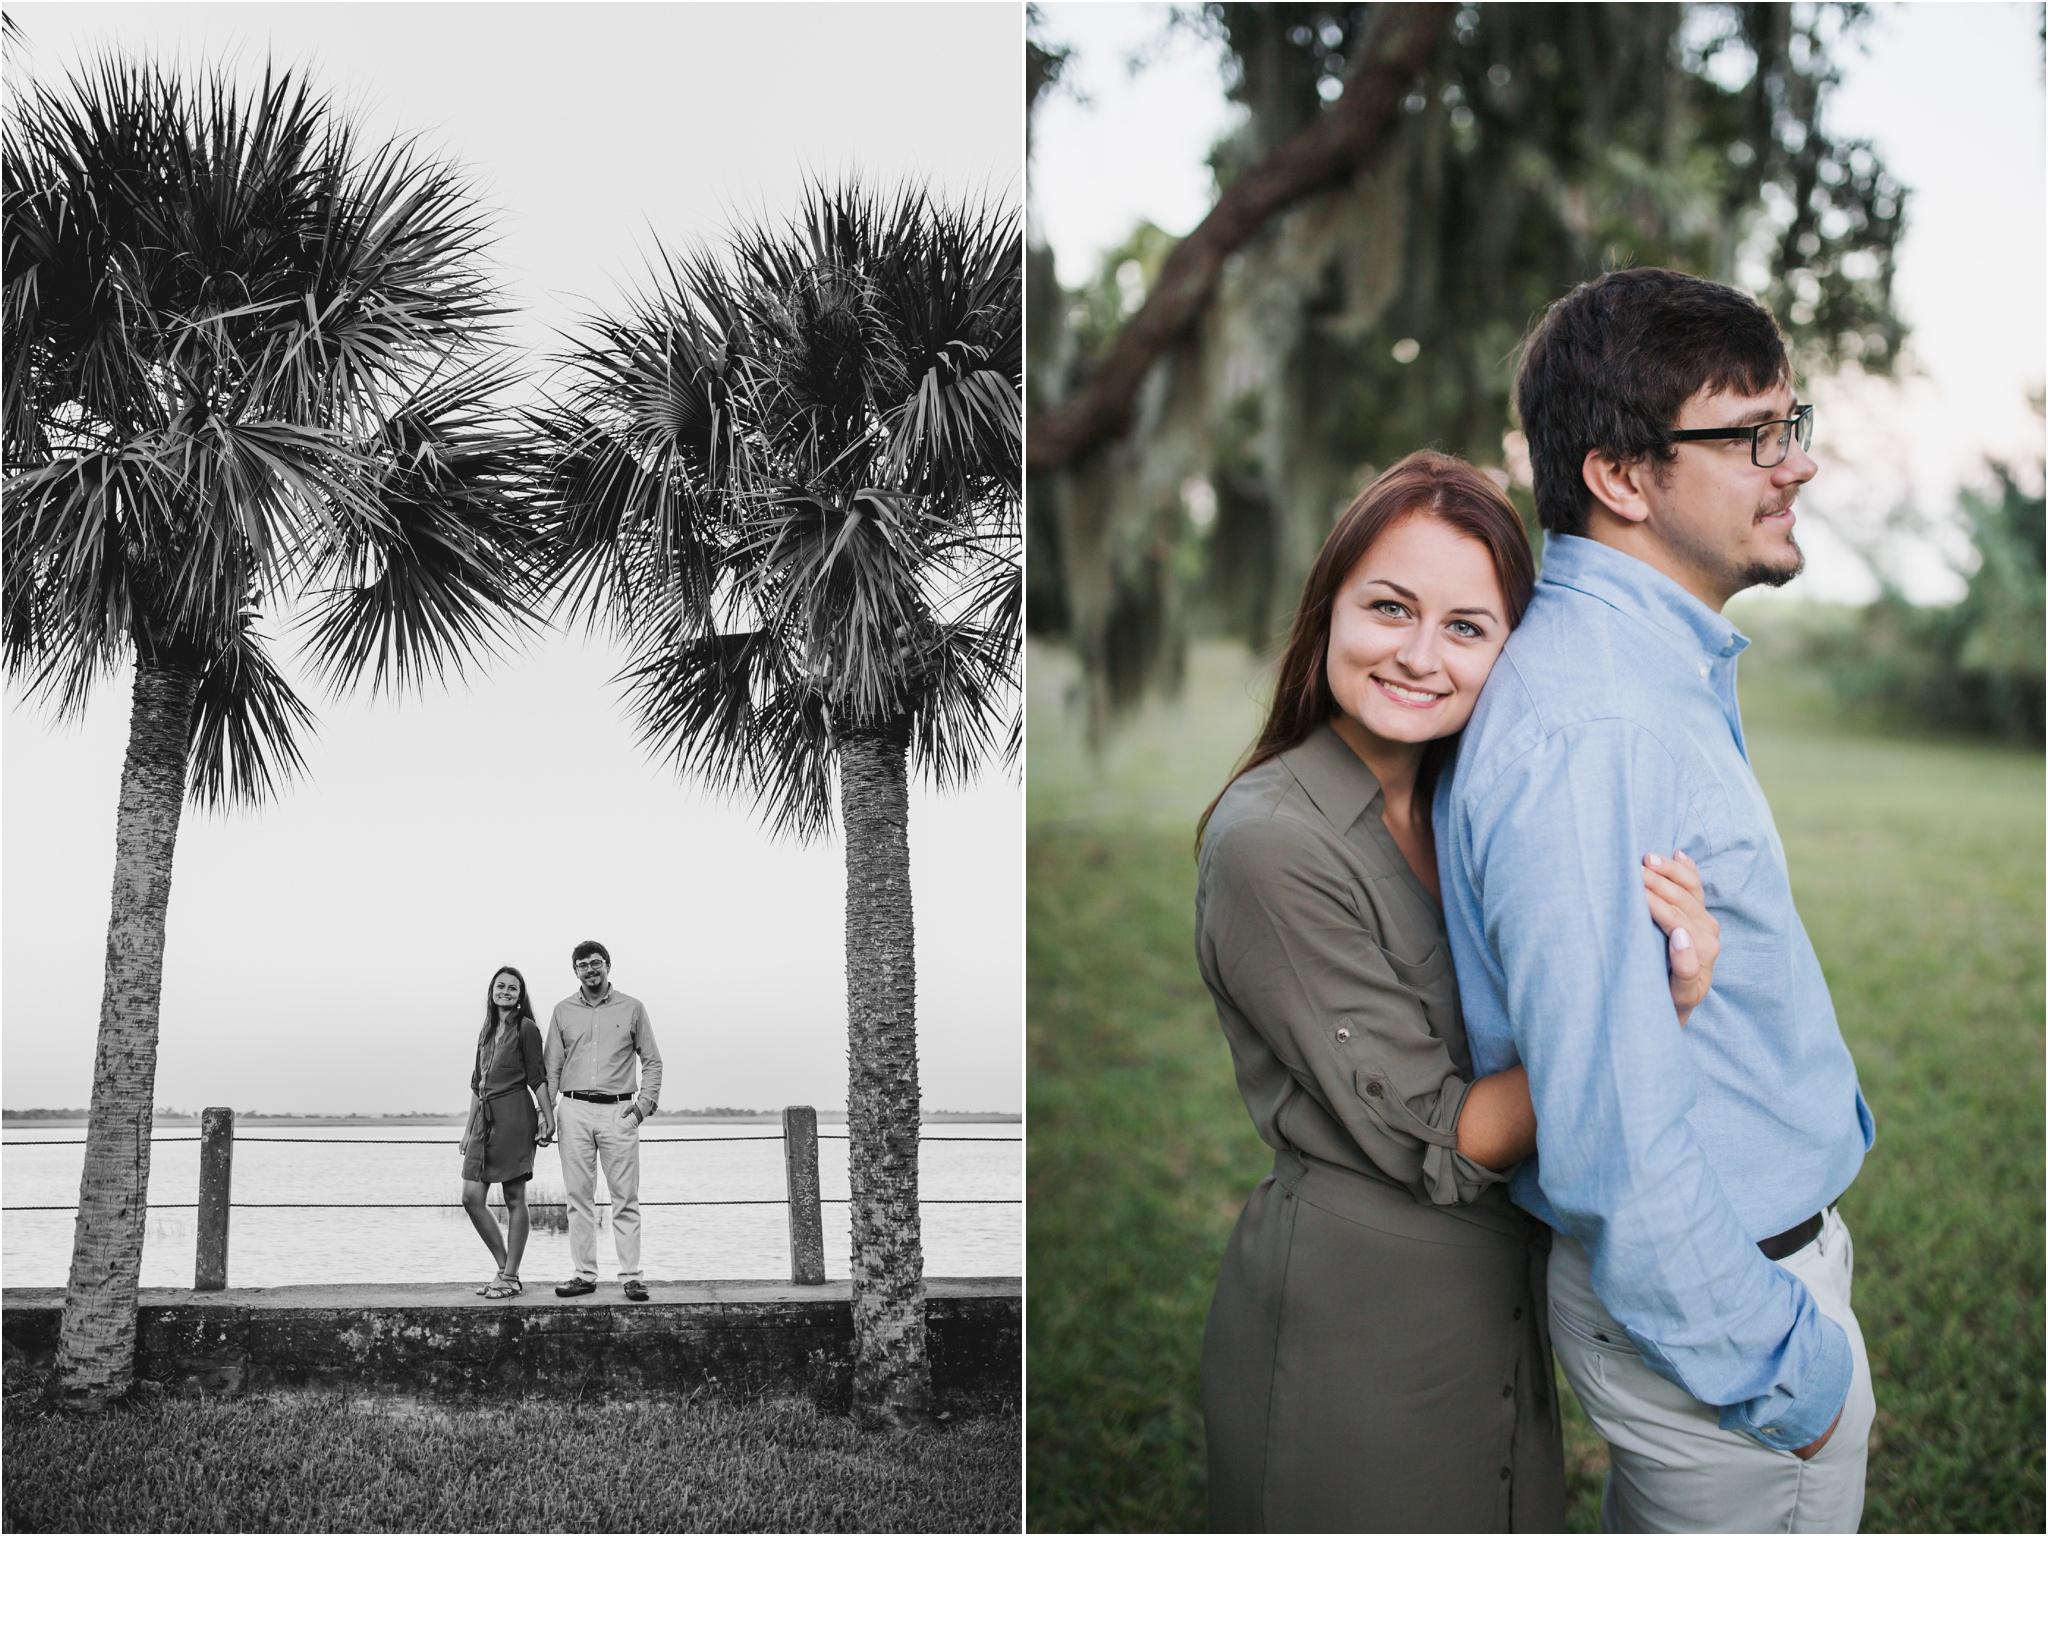 Rainey_Gregg_Photography_St._Simons_Island_Georgia_California_Wedding_Portrait_Photography_1375.jpg